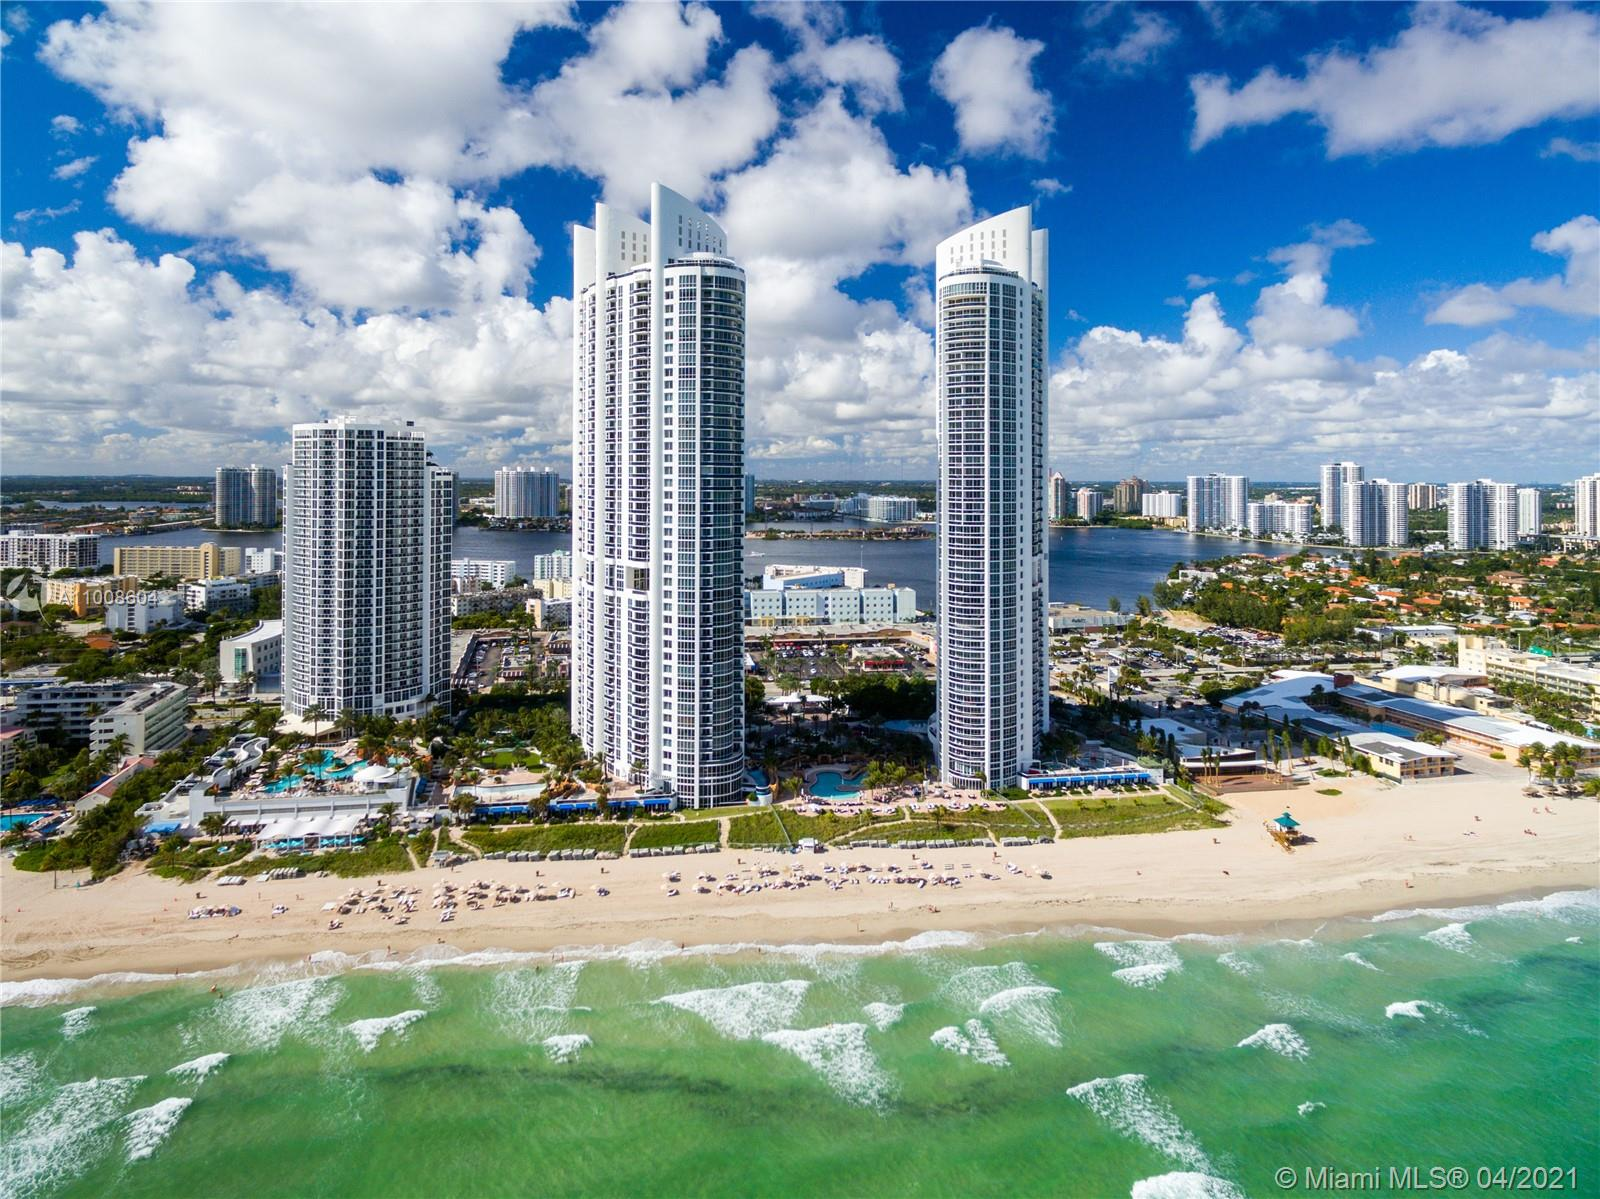 Trump Royale #1601A - 18201 Collins Ave #1601A, Sunny Isles Beach, FL 33160